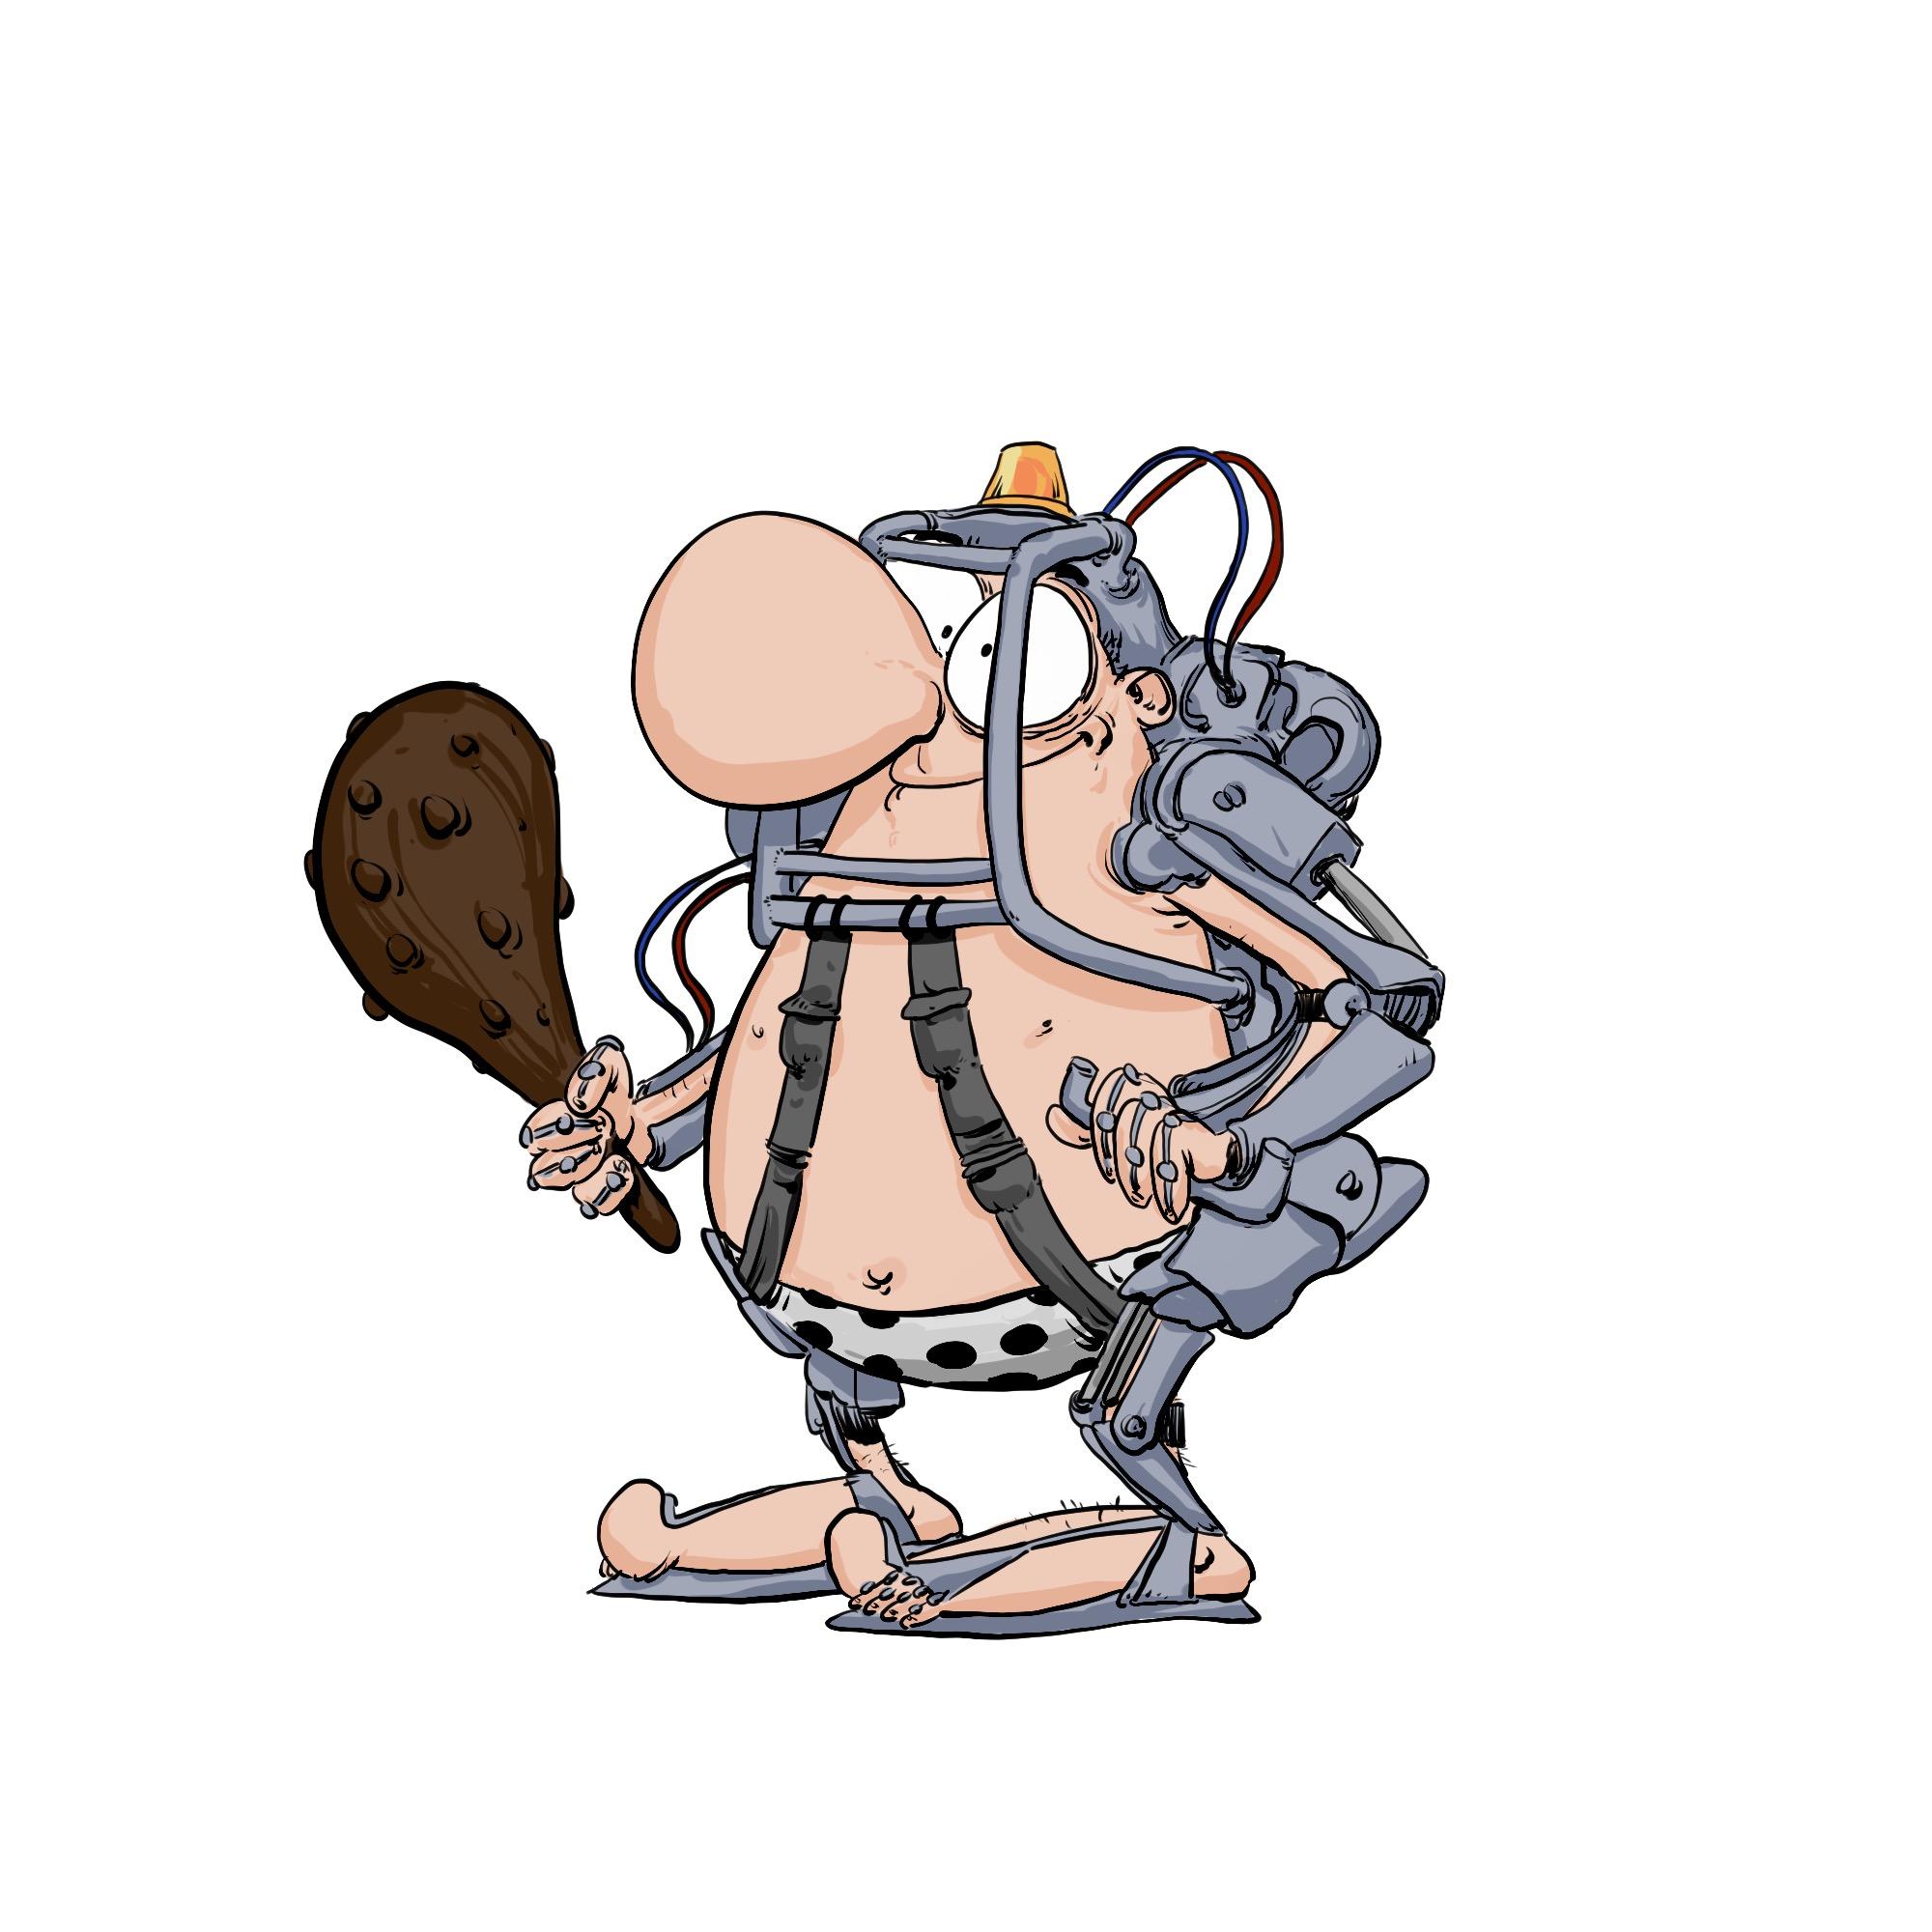 exosquelette à la sauce CRO